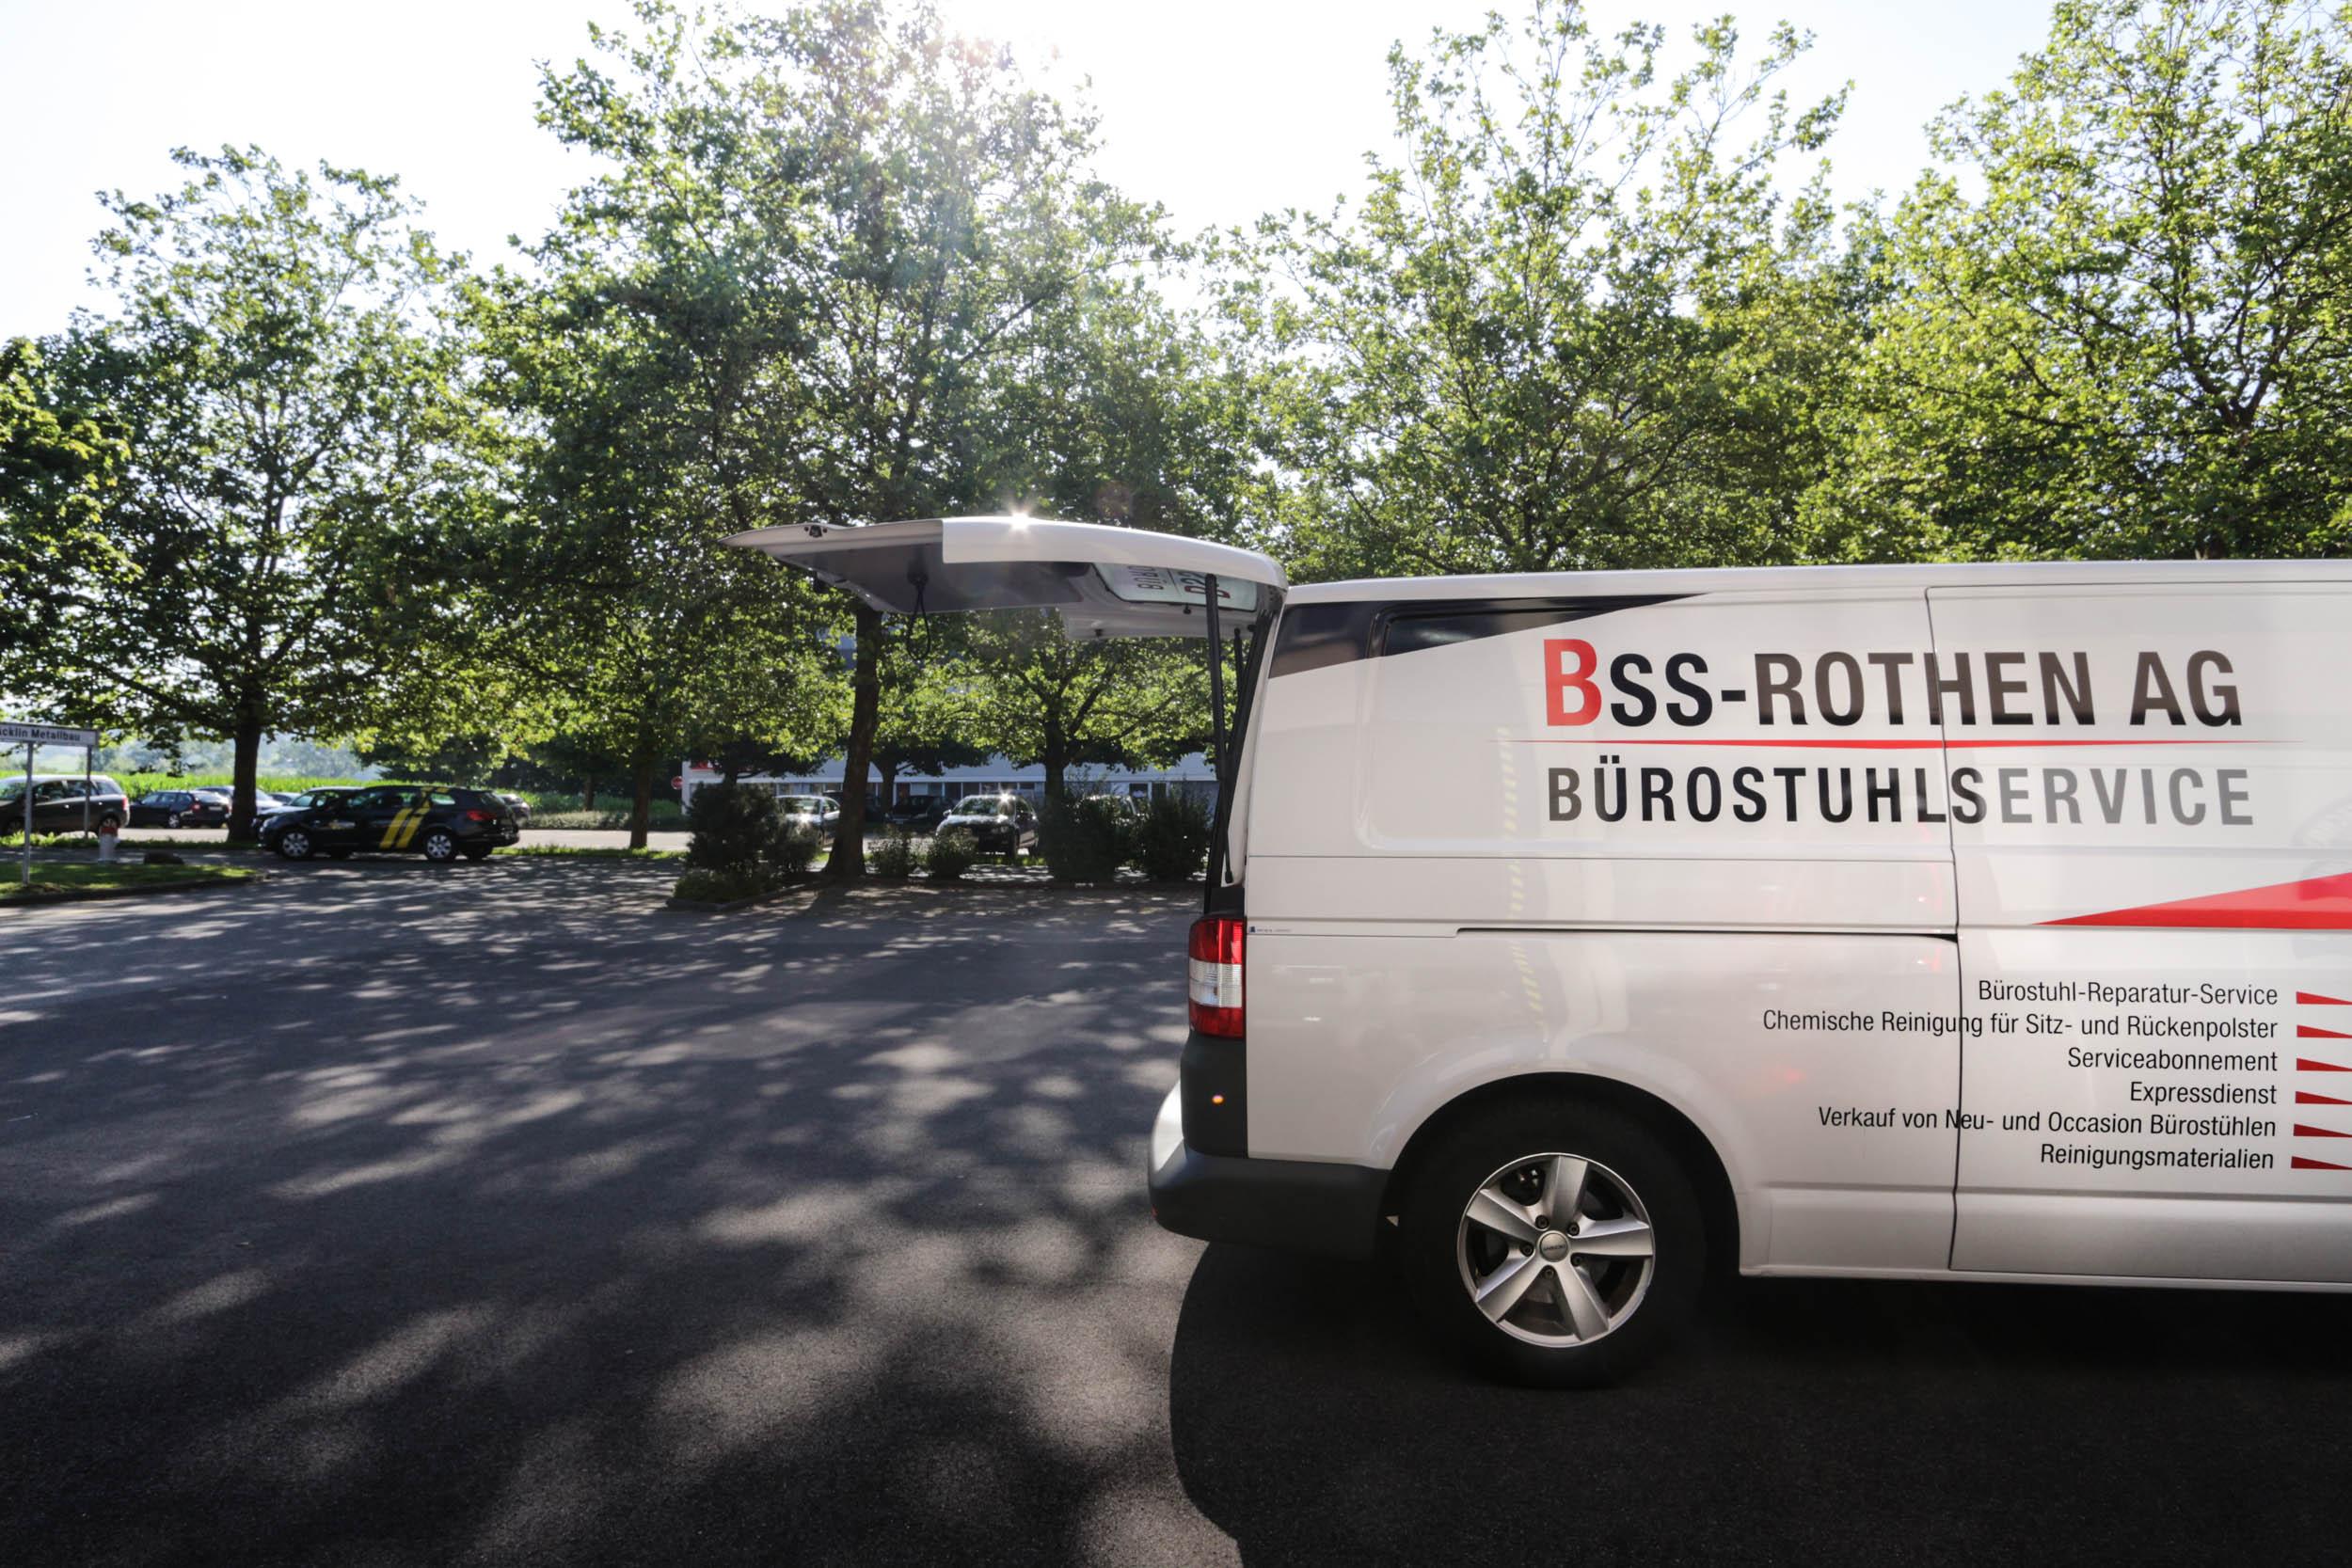 BSS-Rothen AG - mobile Werkstatt